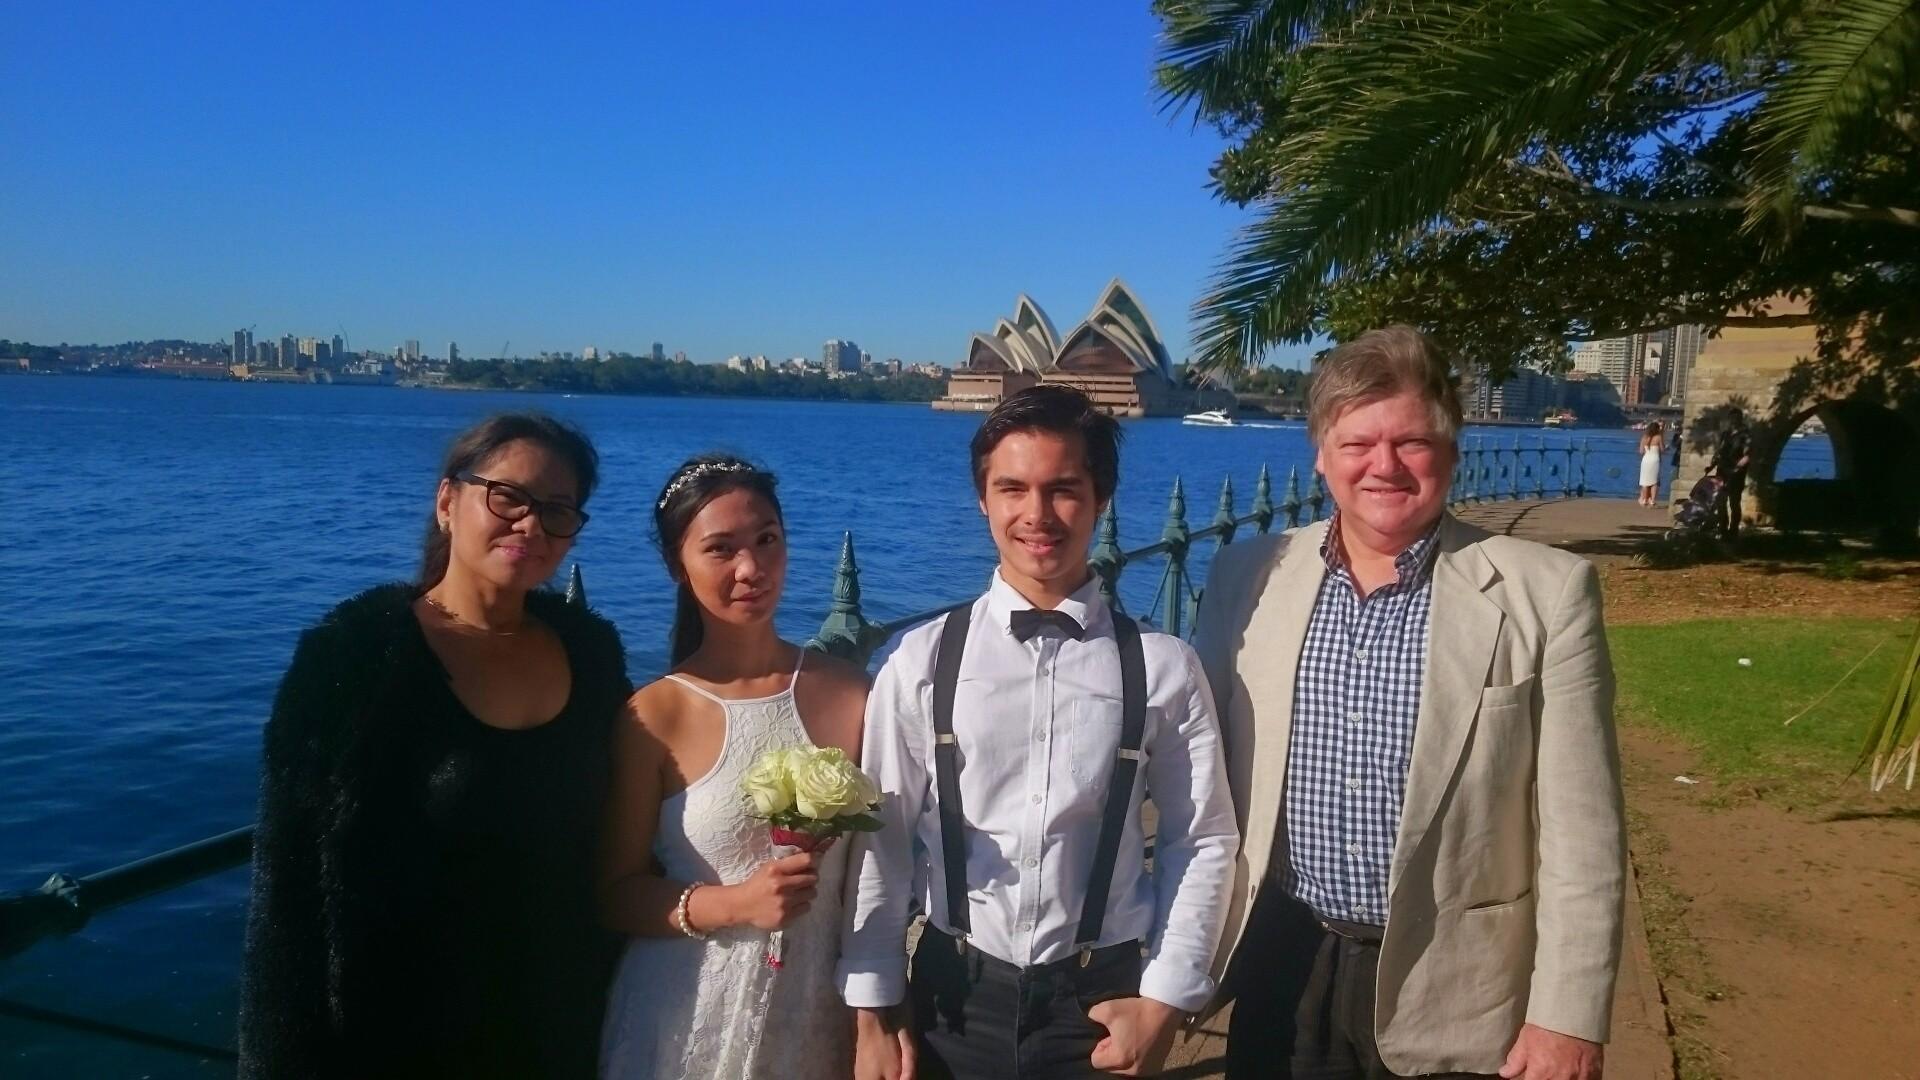 Simple-Ceremonies_Marriage Celebrant_Wedding-celebrant_Bradfield Park_North Sydney_NSW_Australia_SimpleCeremonies_RegistryOfficeMarriages_Jess_01